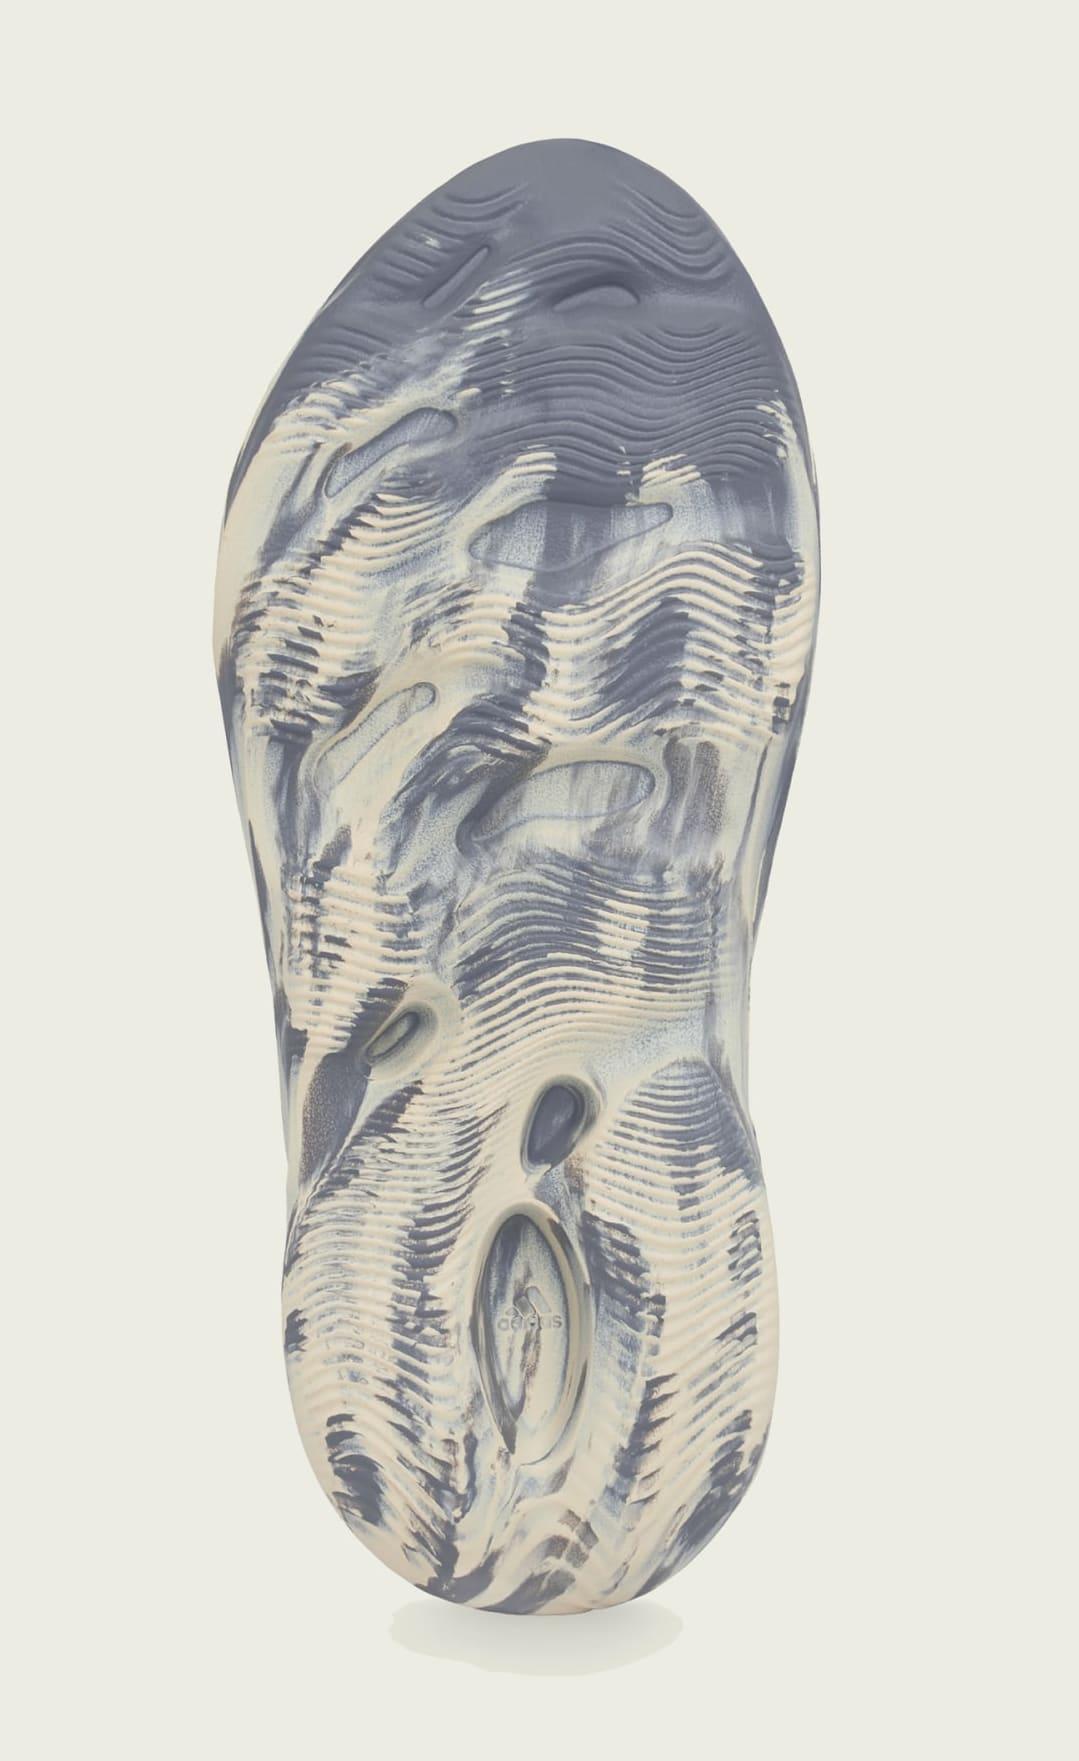 Adidas Yeezy Foam Runner 'Mxt Moon Gray' GV7904 Outsole